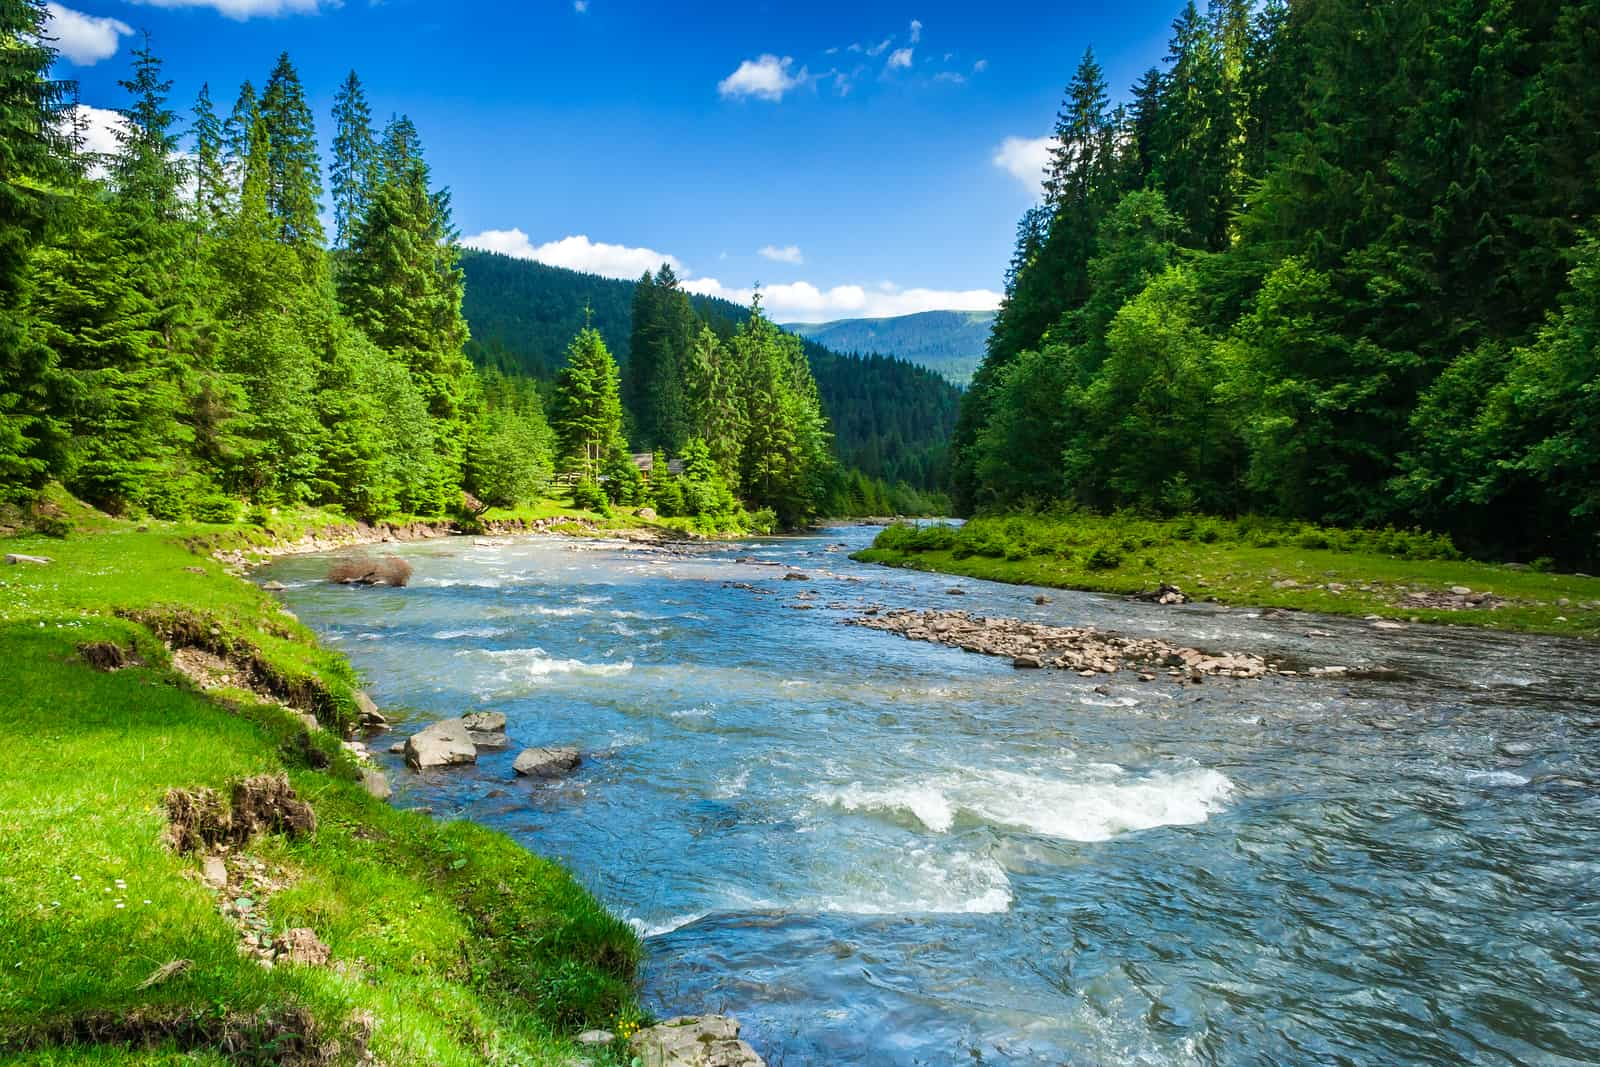 https://i2.wp.com/www.theparadigmrealtygroup.com/wp-content/uploads/2017/10/bigstock-Mountain-River-44123662.jpg